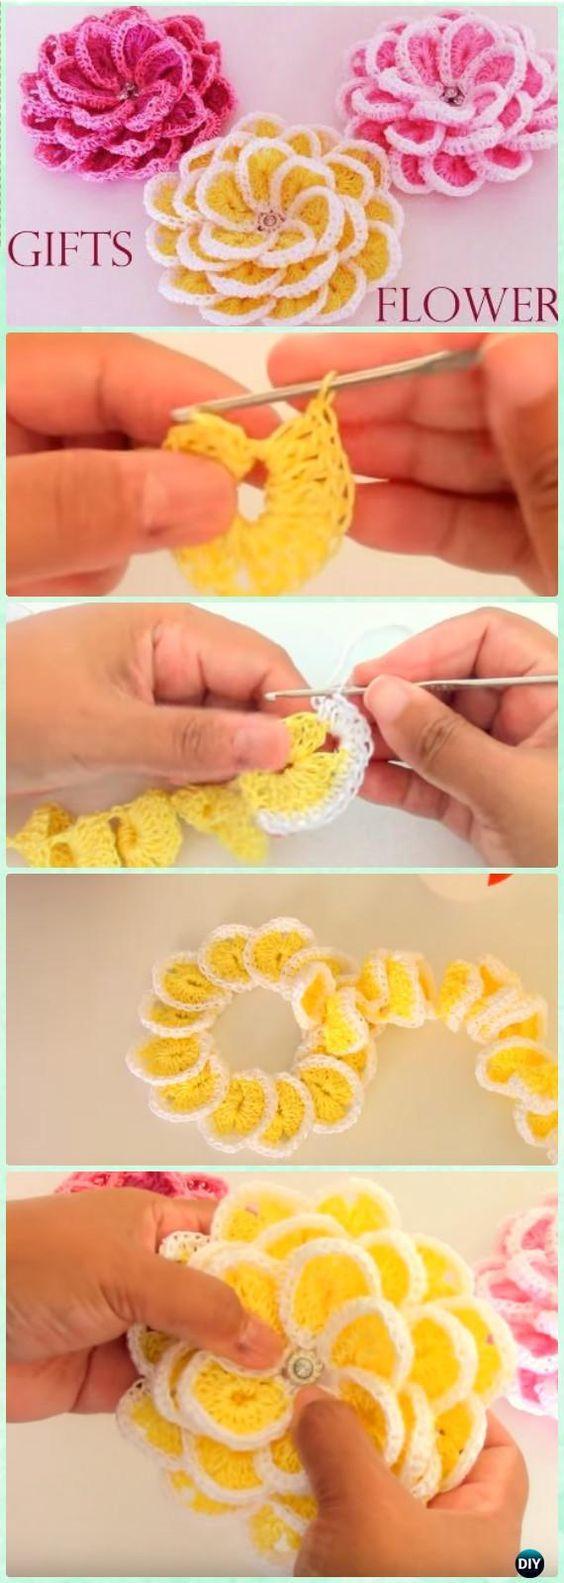 My Hobby Is Crochet: Crochet 3D Flower Motif Free Patterns & Instructio...